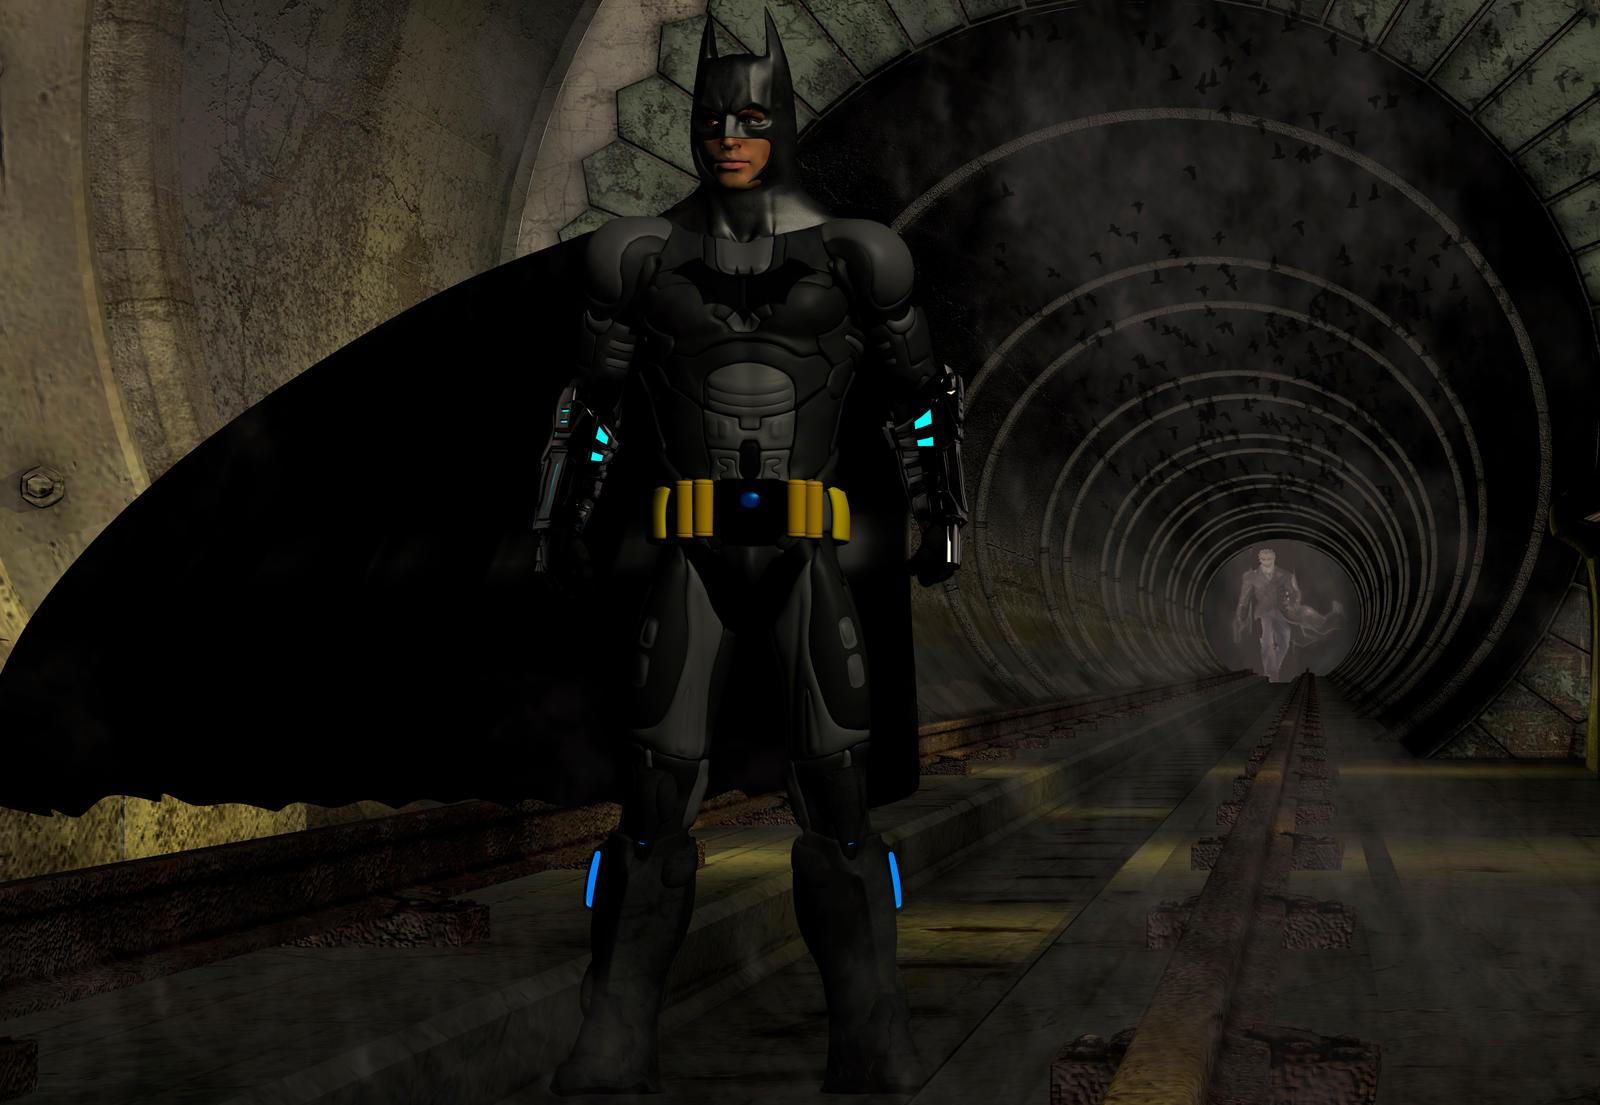 Batman in the tube by hiram67